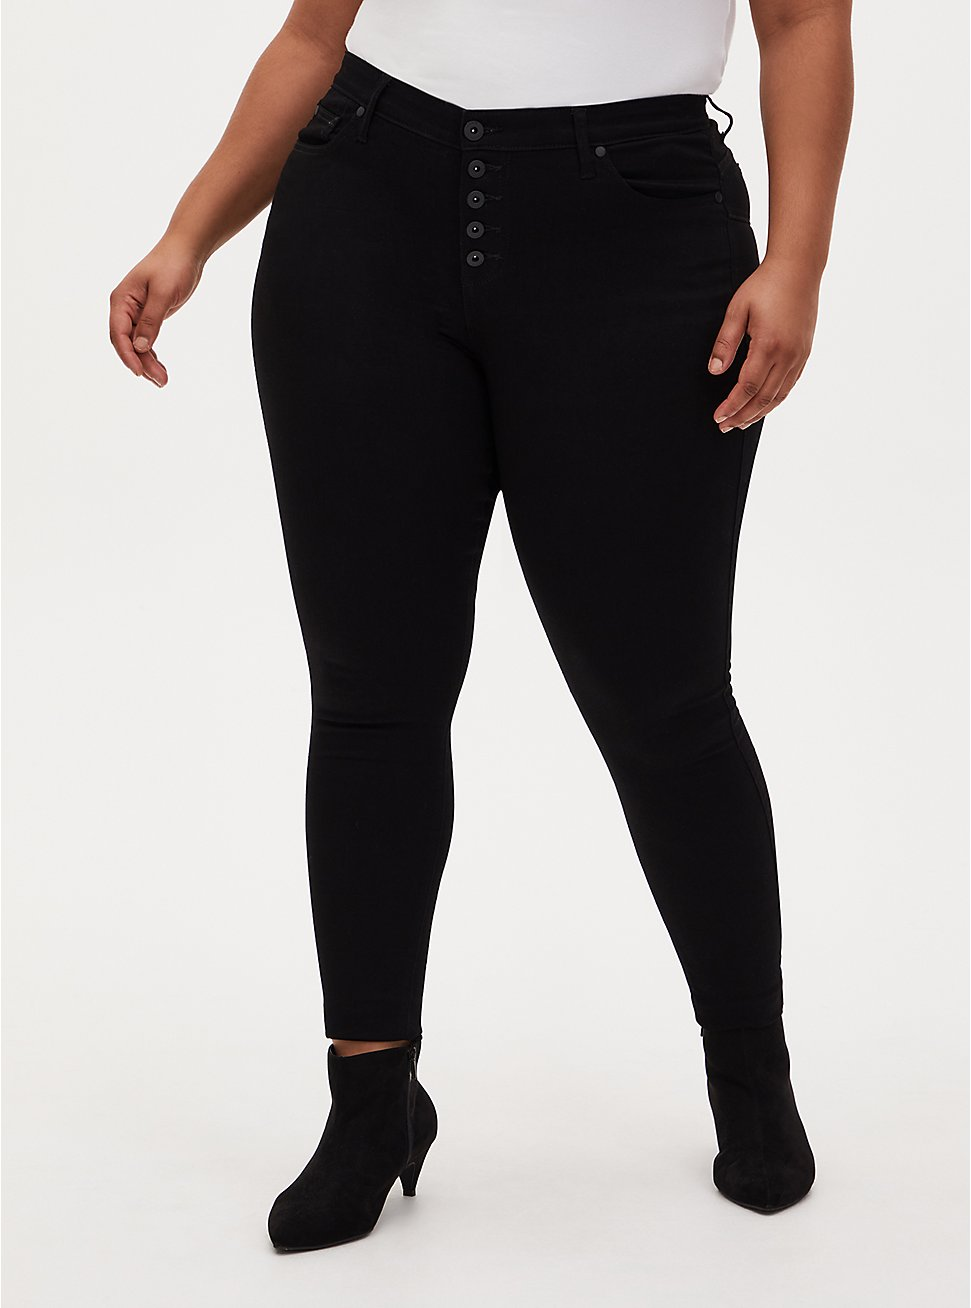 Bombshell Skinny Jean - Super Soft Black, BLACK, hi-res